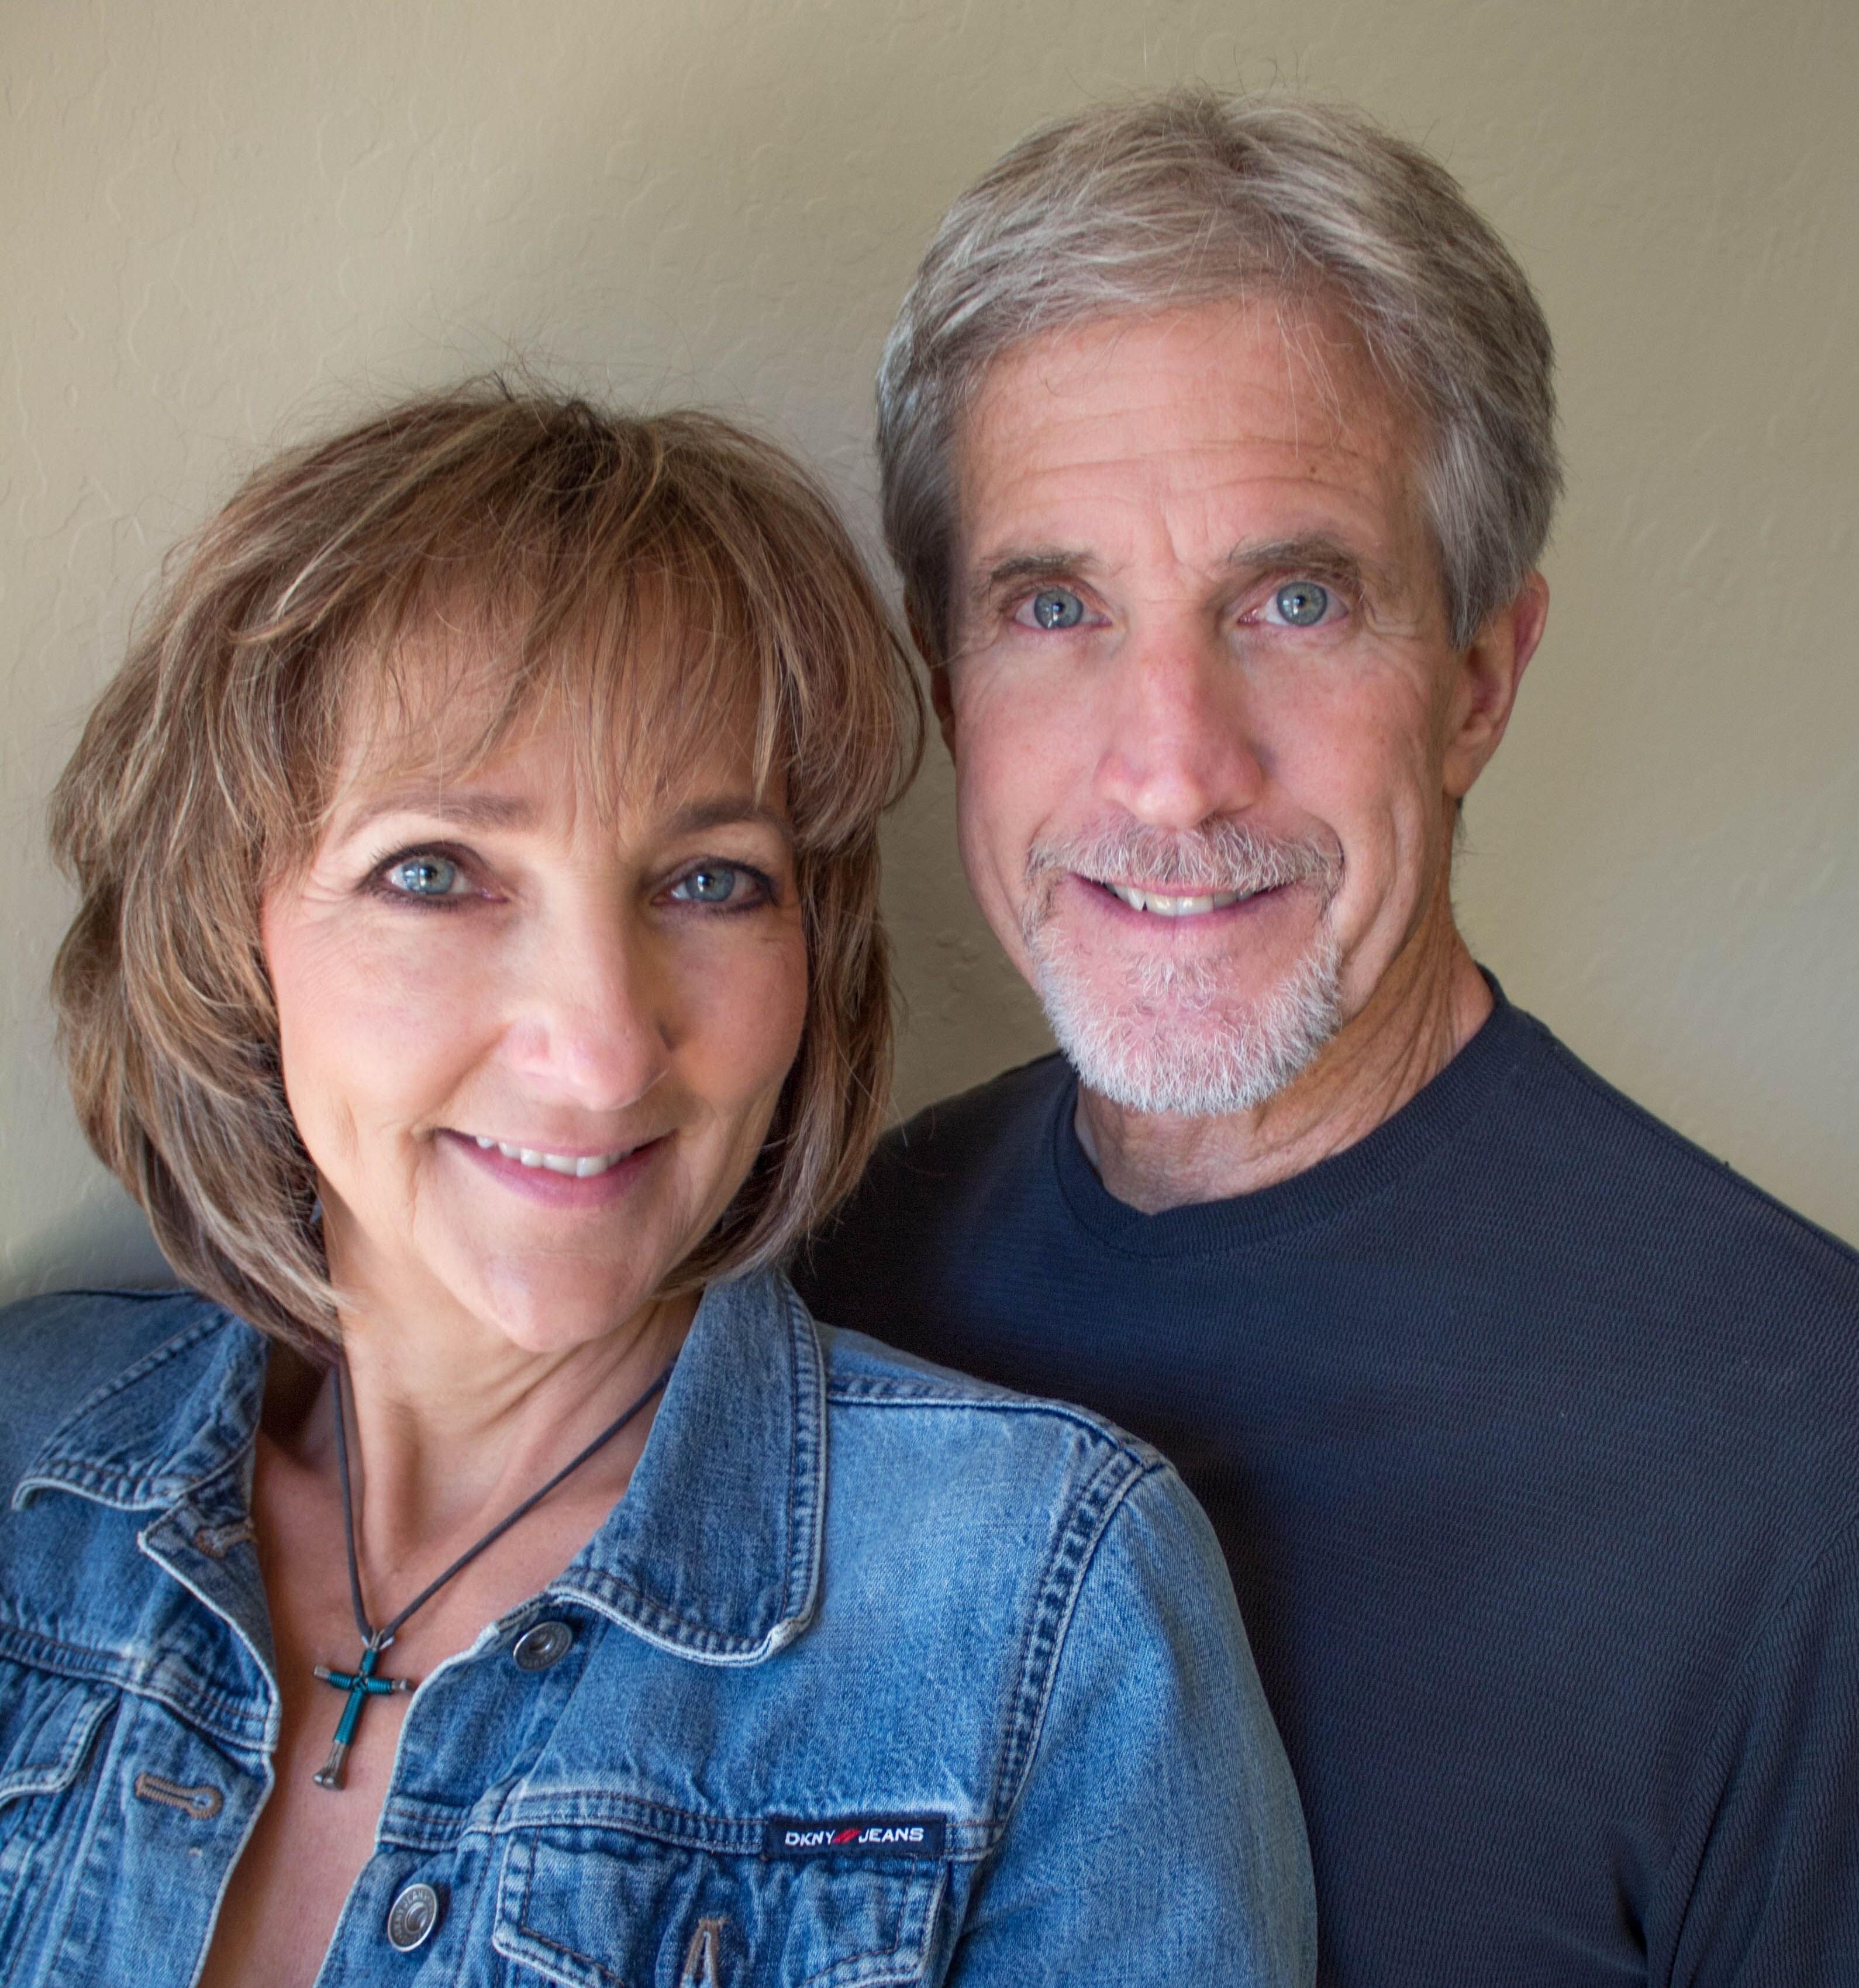 Dave & Kebra undefined Stapp